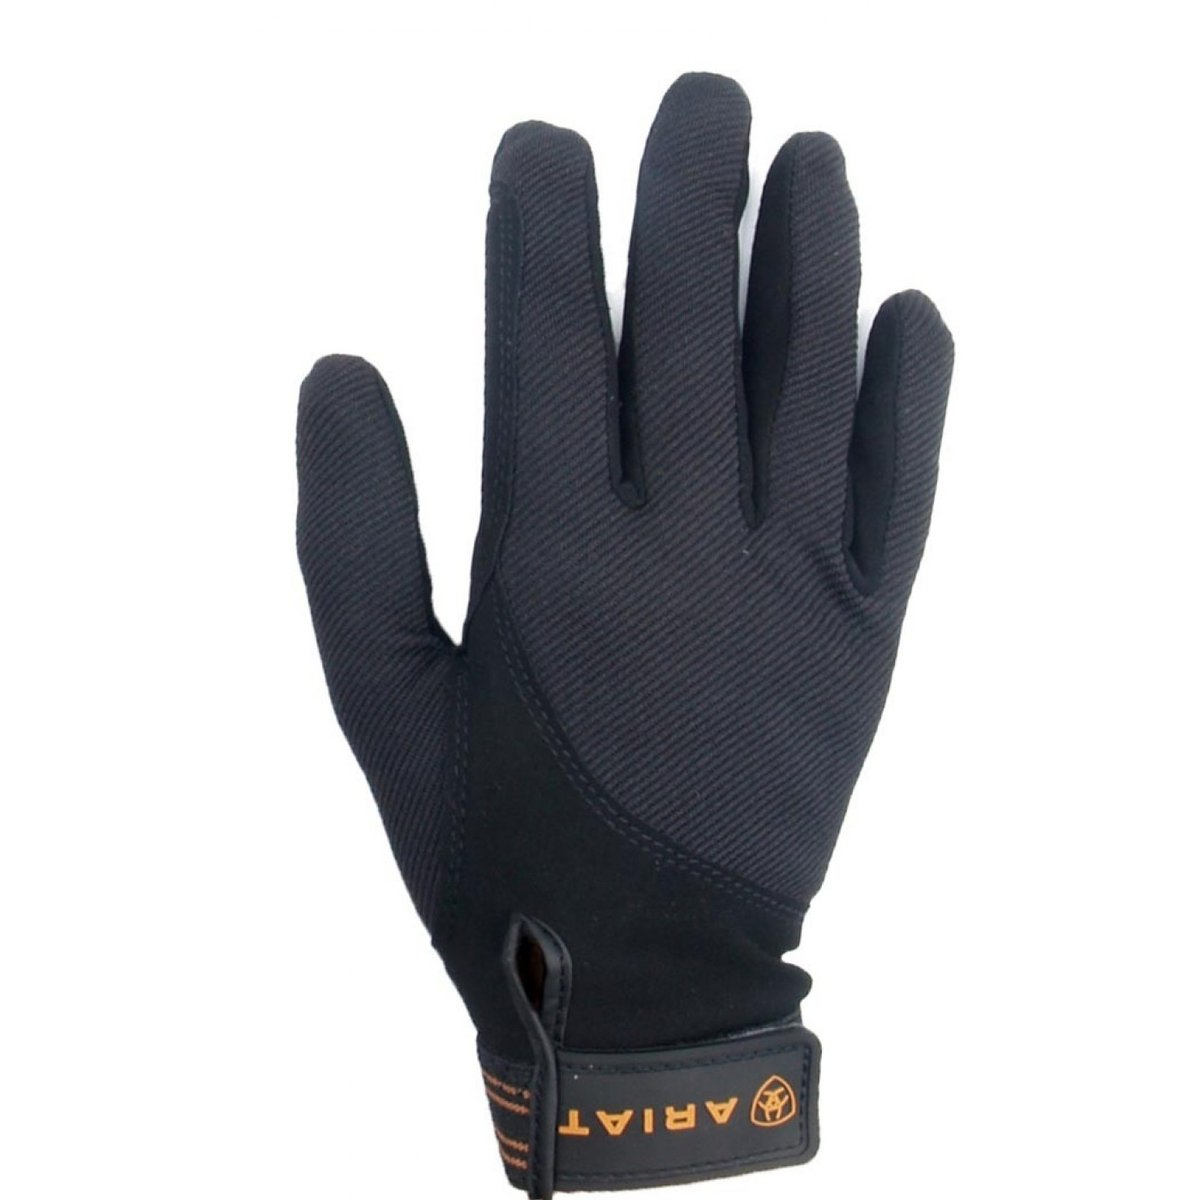 Imagem de Ariat Glove Insulated Tek Grip Black 10